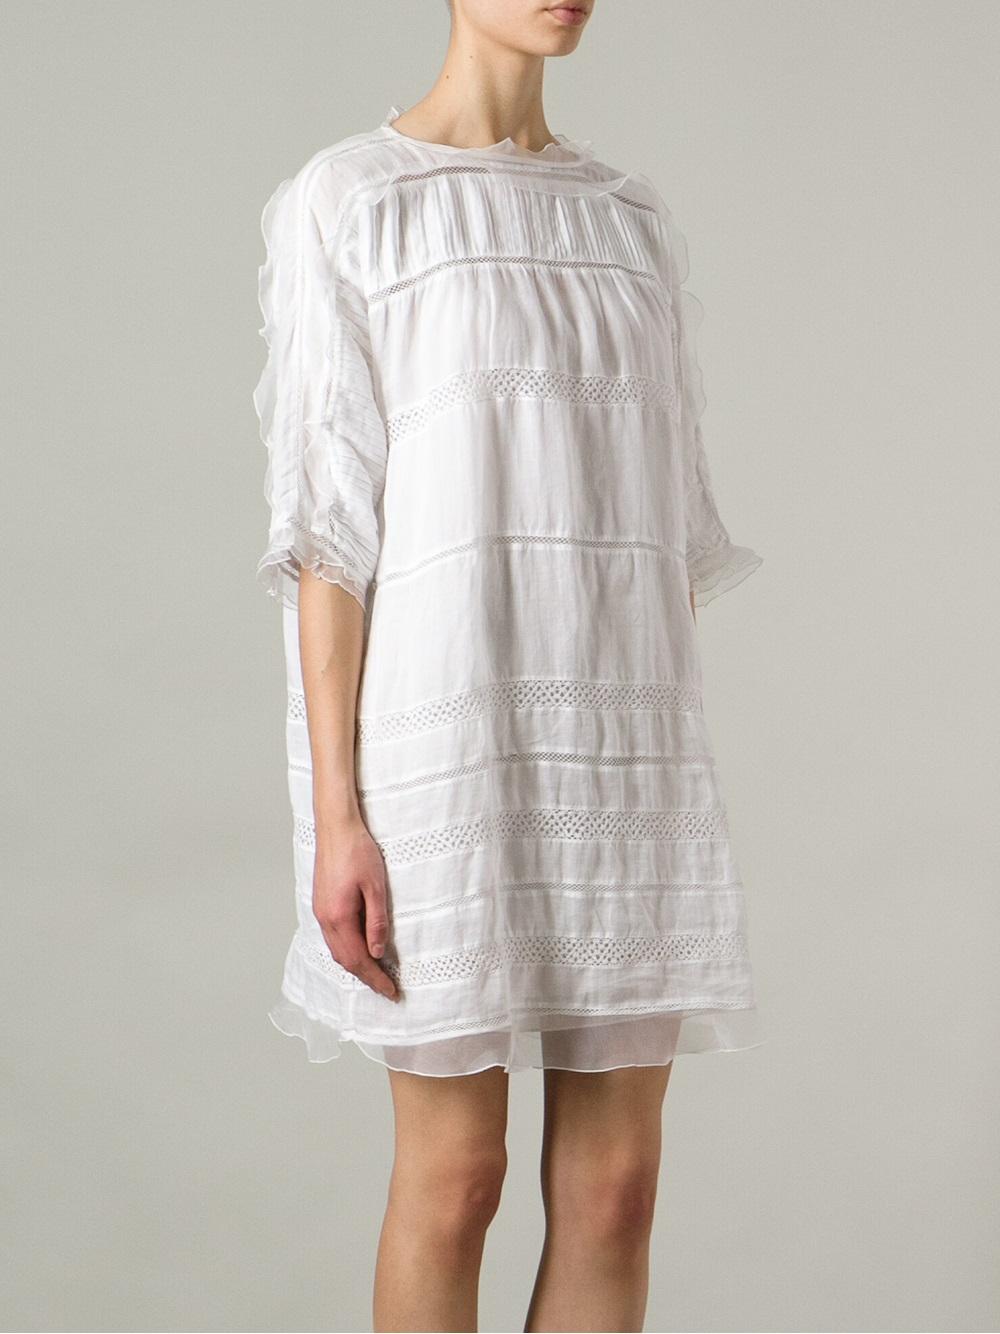 Lyst isabel marant odrys dress in white for Isabel marant shirt dress